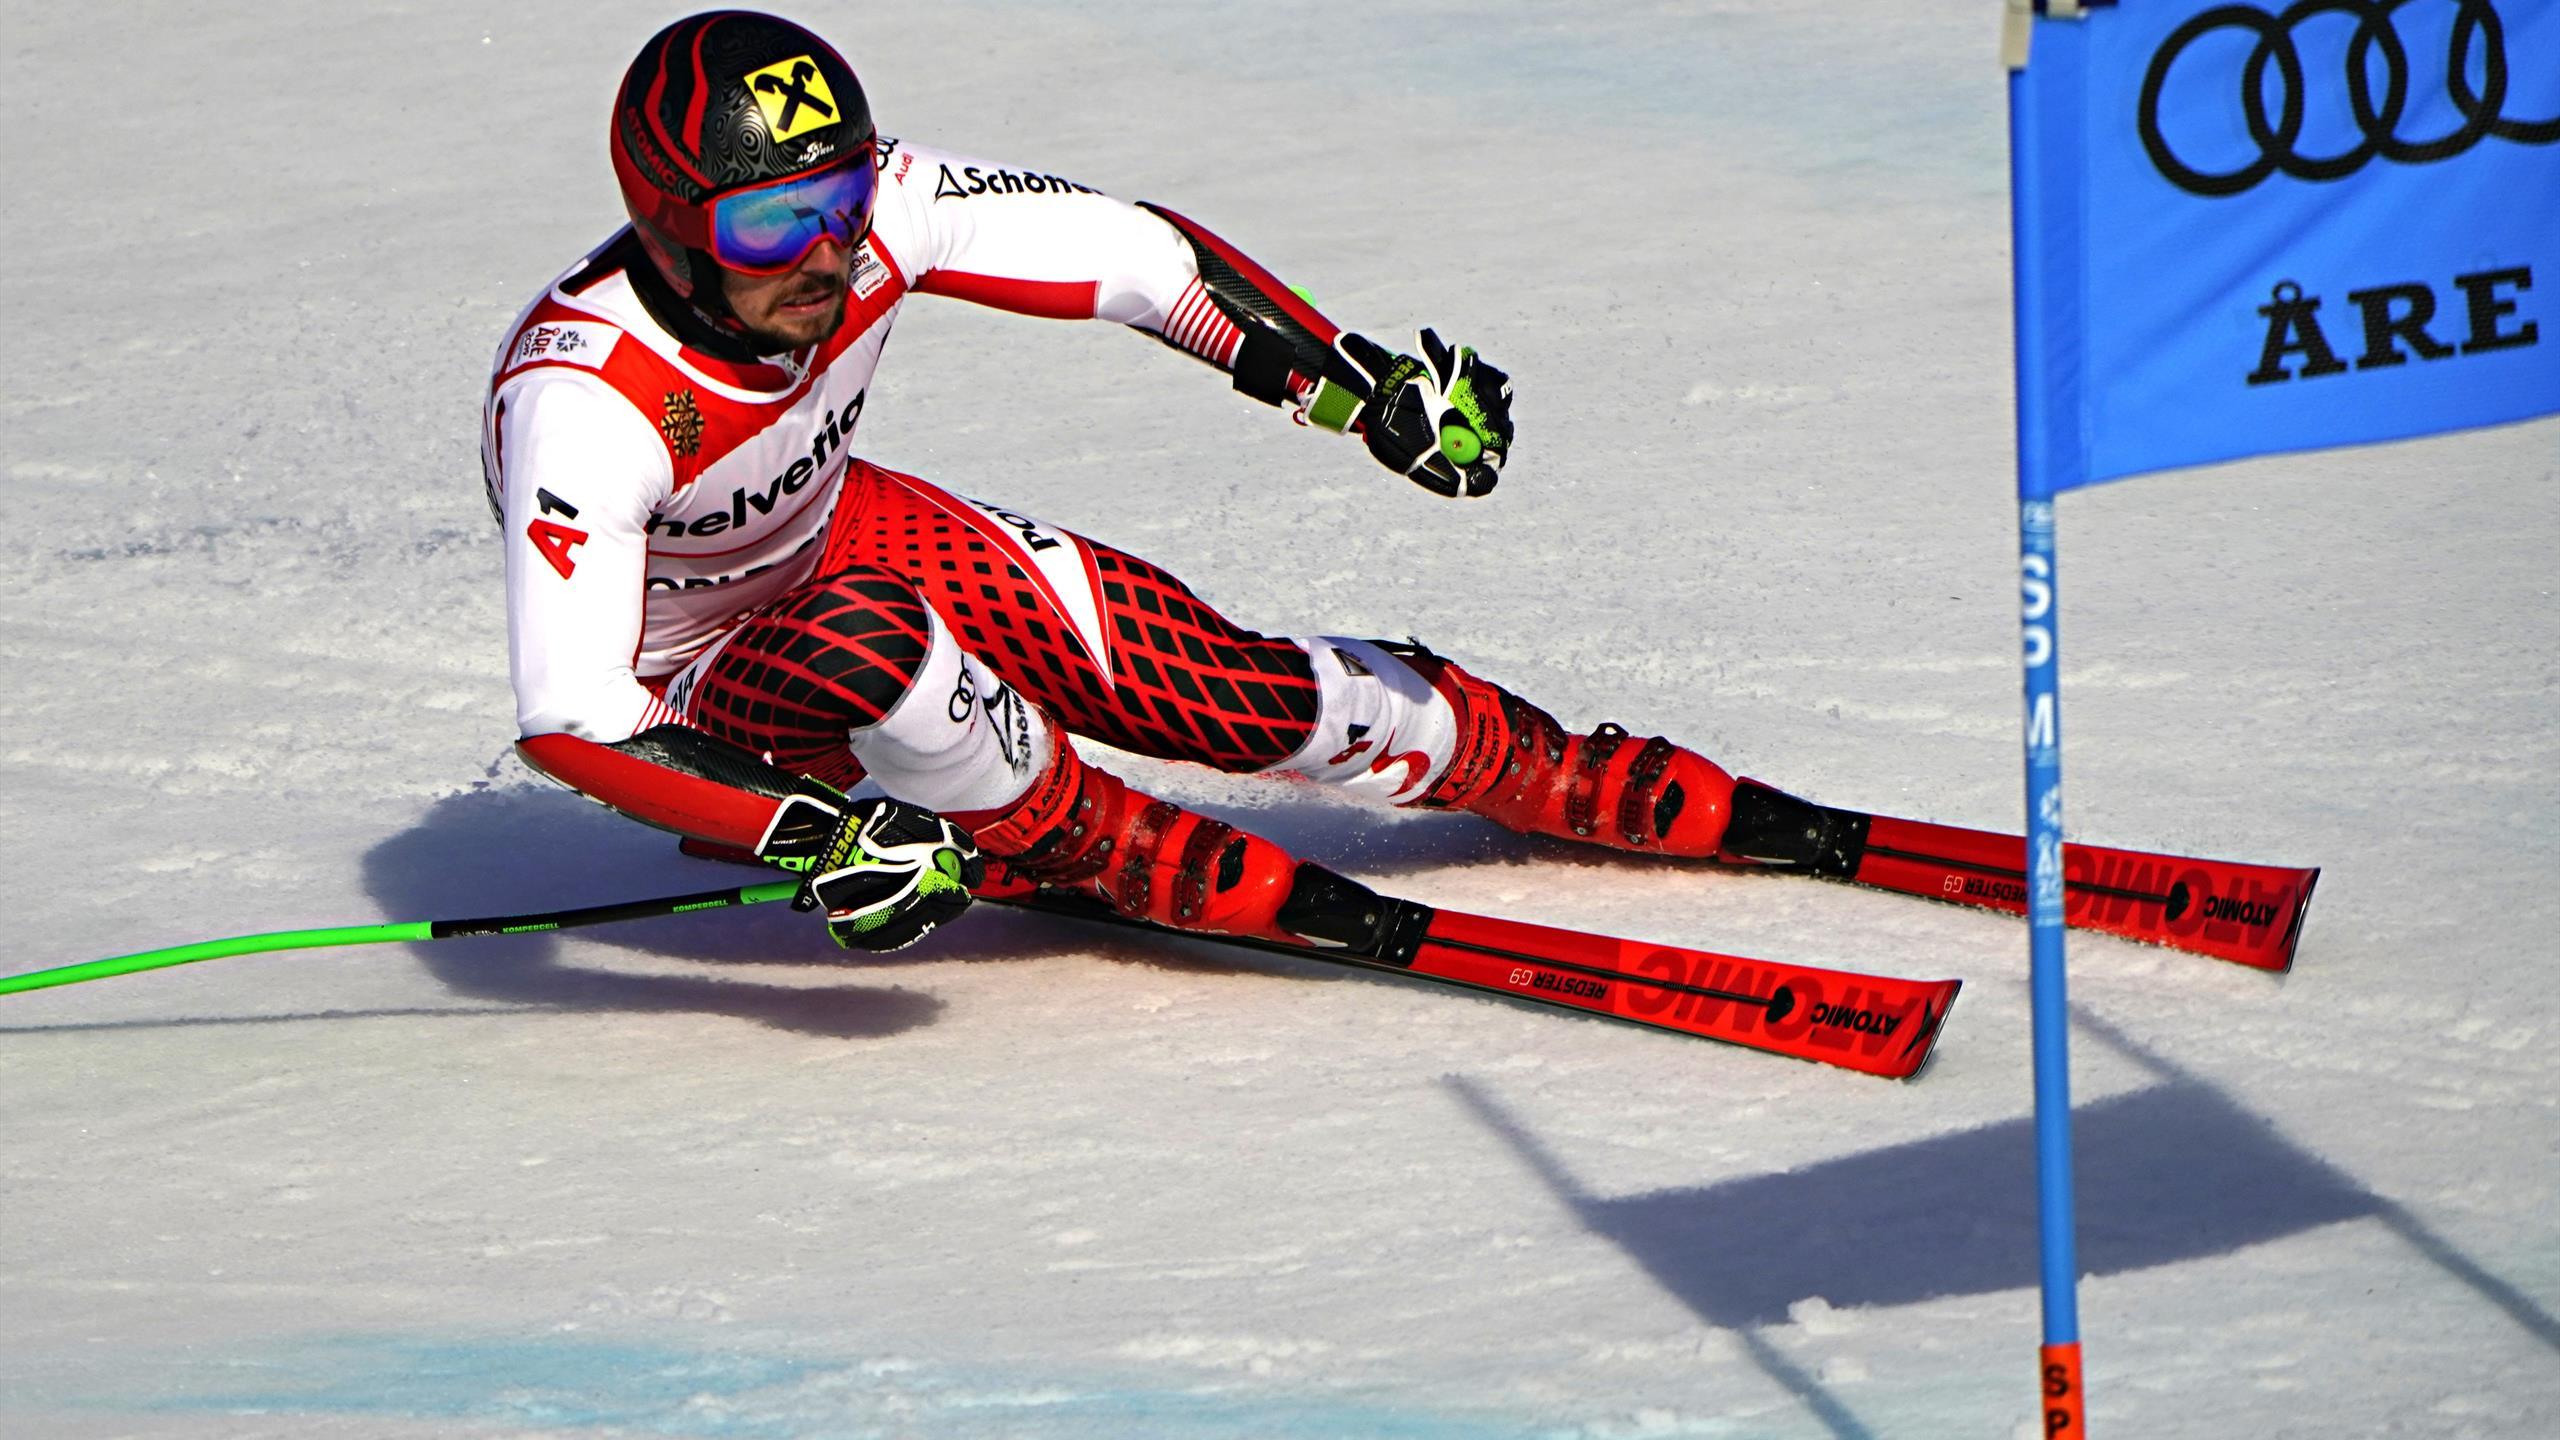 Ski Alpin Heute Im Tv